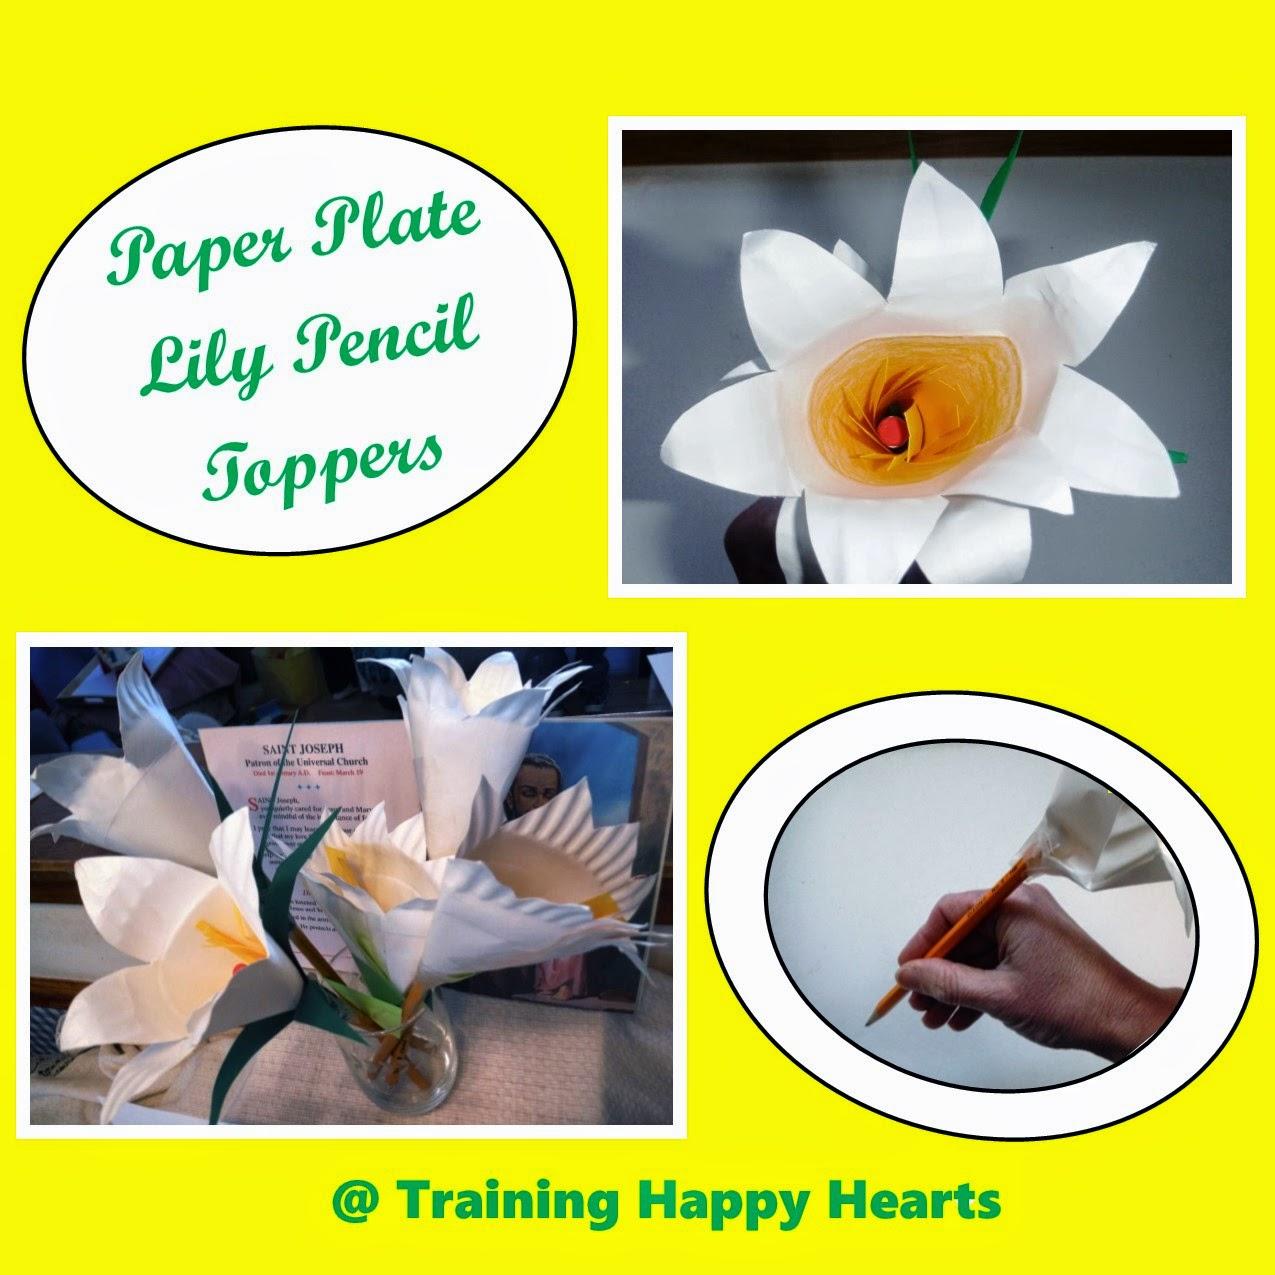 http://traininghappyhearts.blogspot.com/2015/03/a-simple-seasonal-craft-paper-plate.html